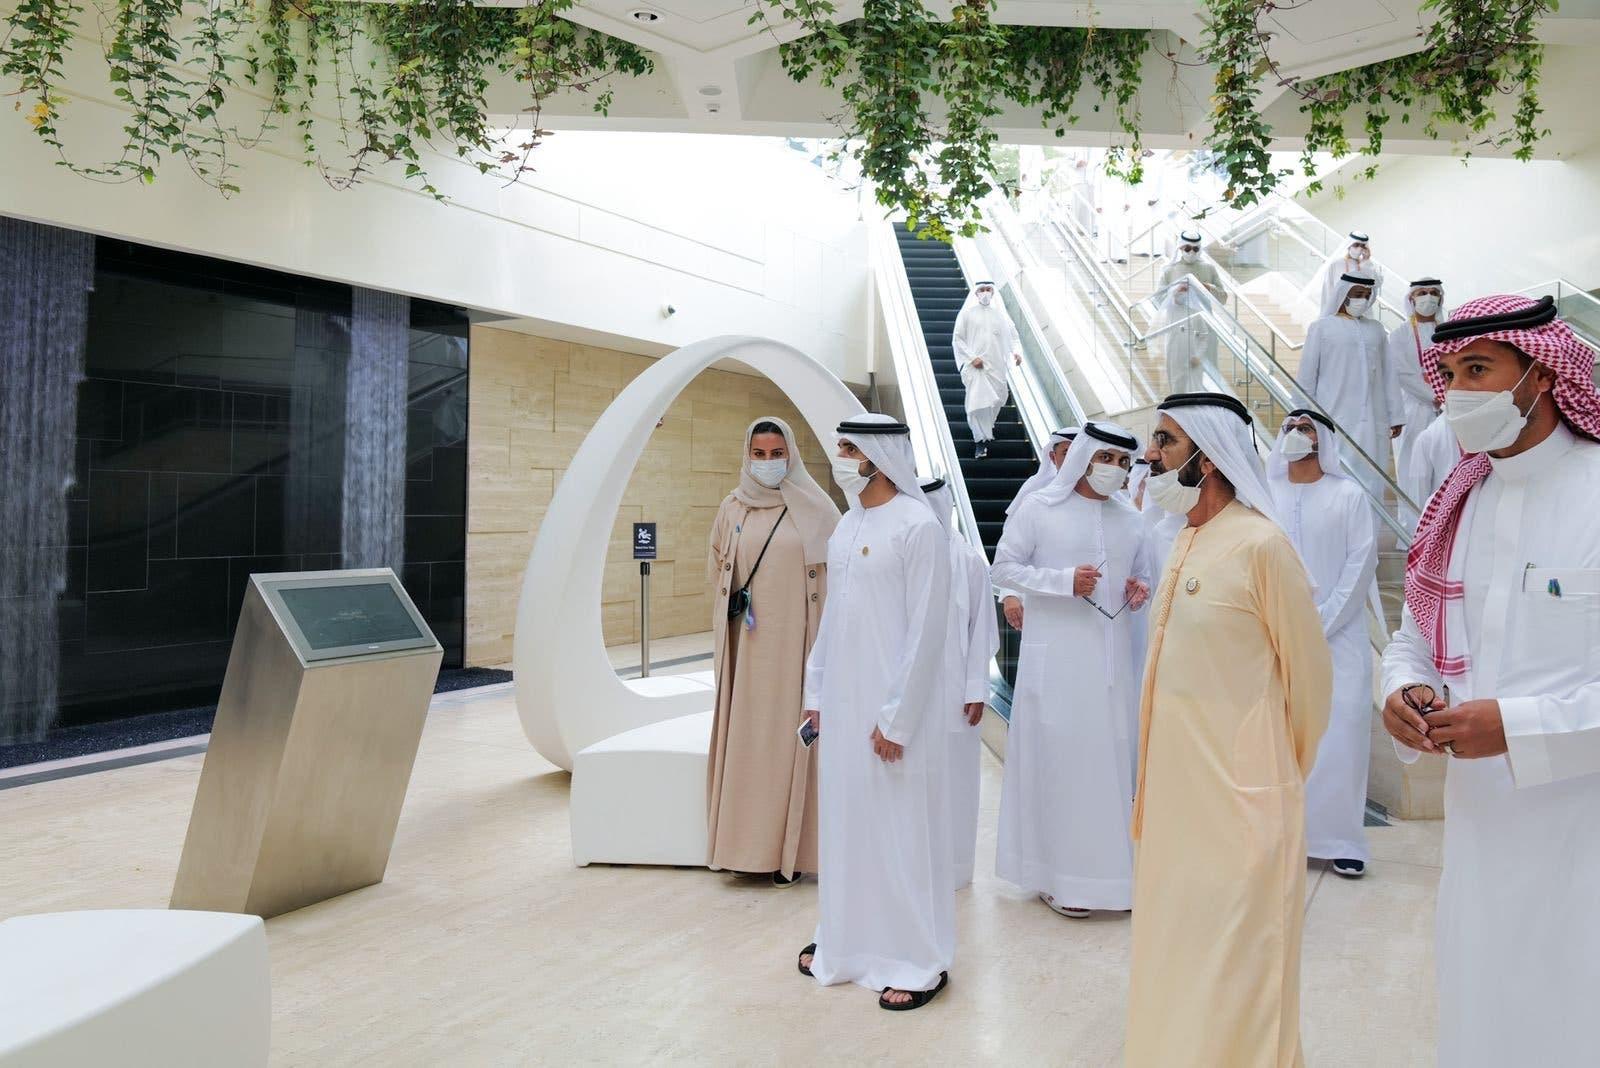 Sheikh Mohammed bin Rashid Al Maktoum visits Saudi Arabia's pavillion at Expo 2020 Dubai. (Twitter)